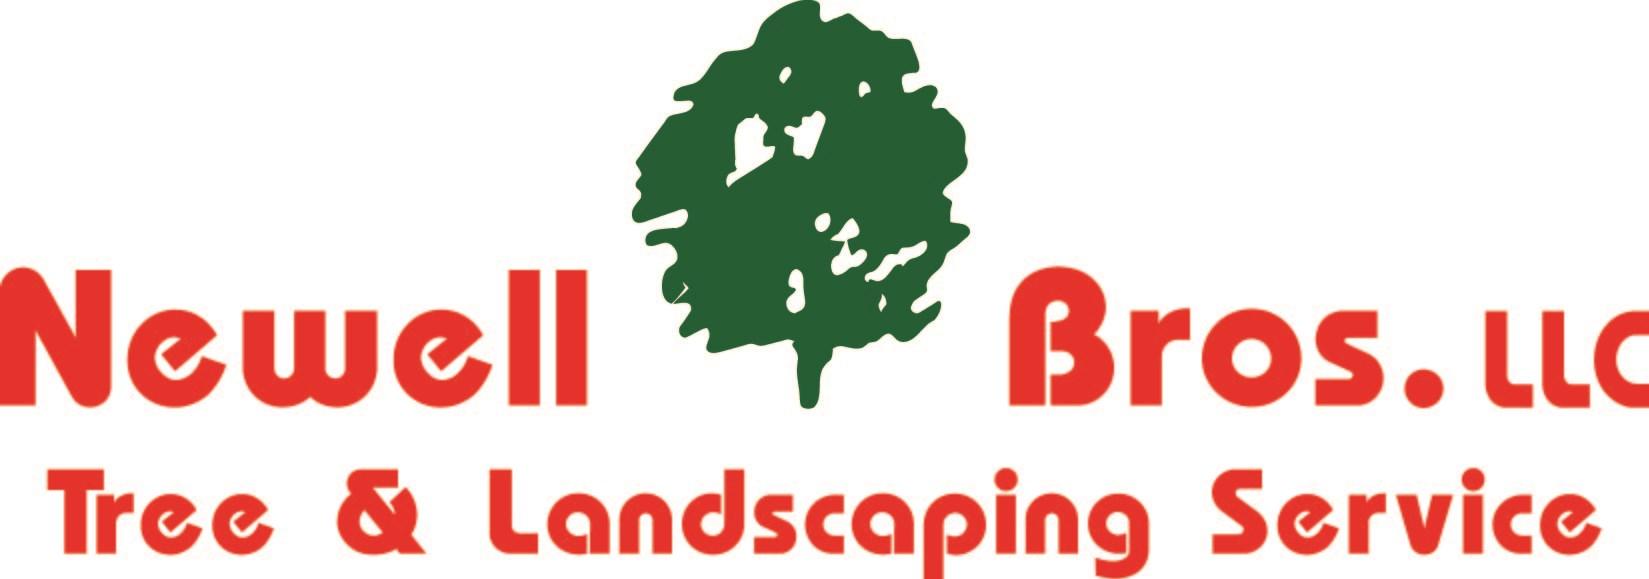 NEWELL BROS TREE & LANDSCAPING logo